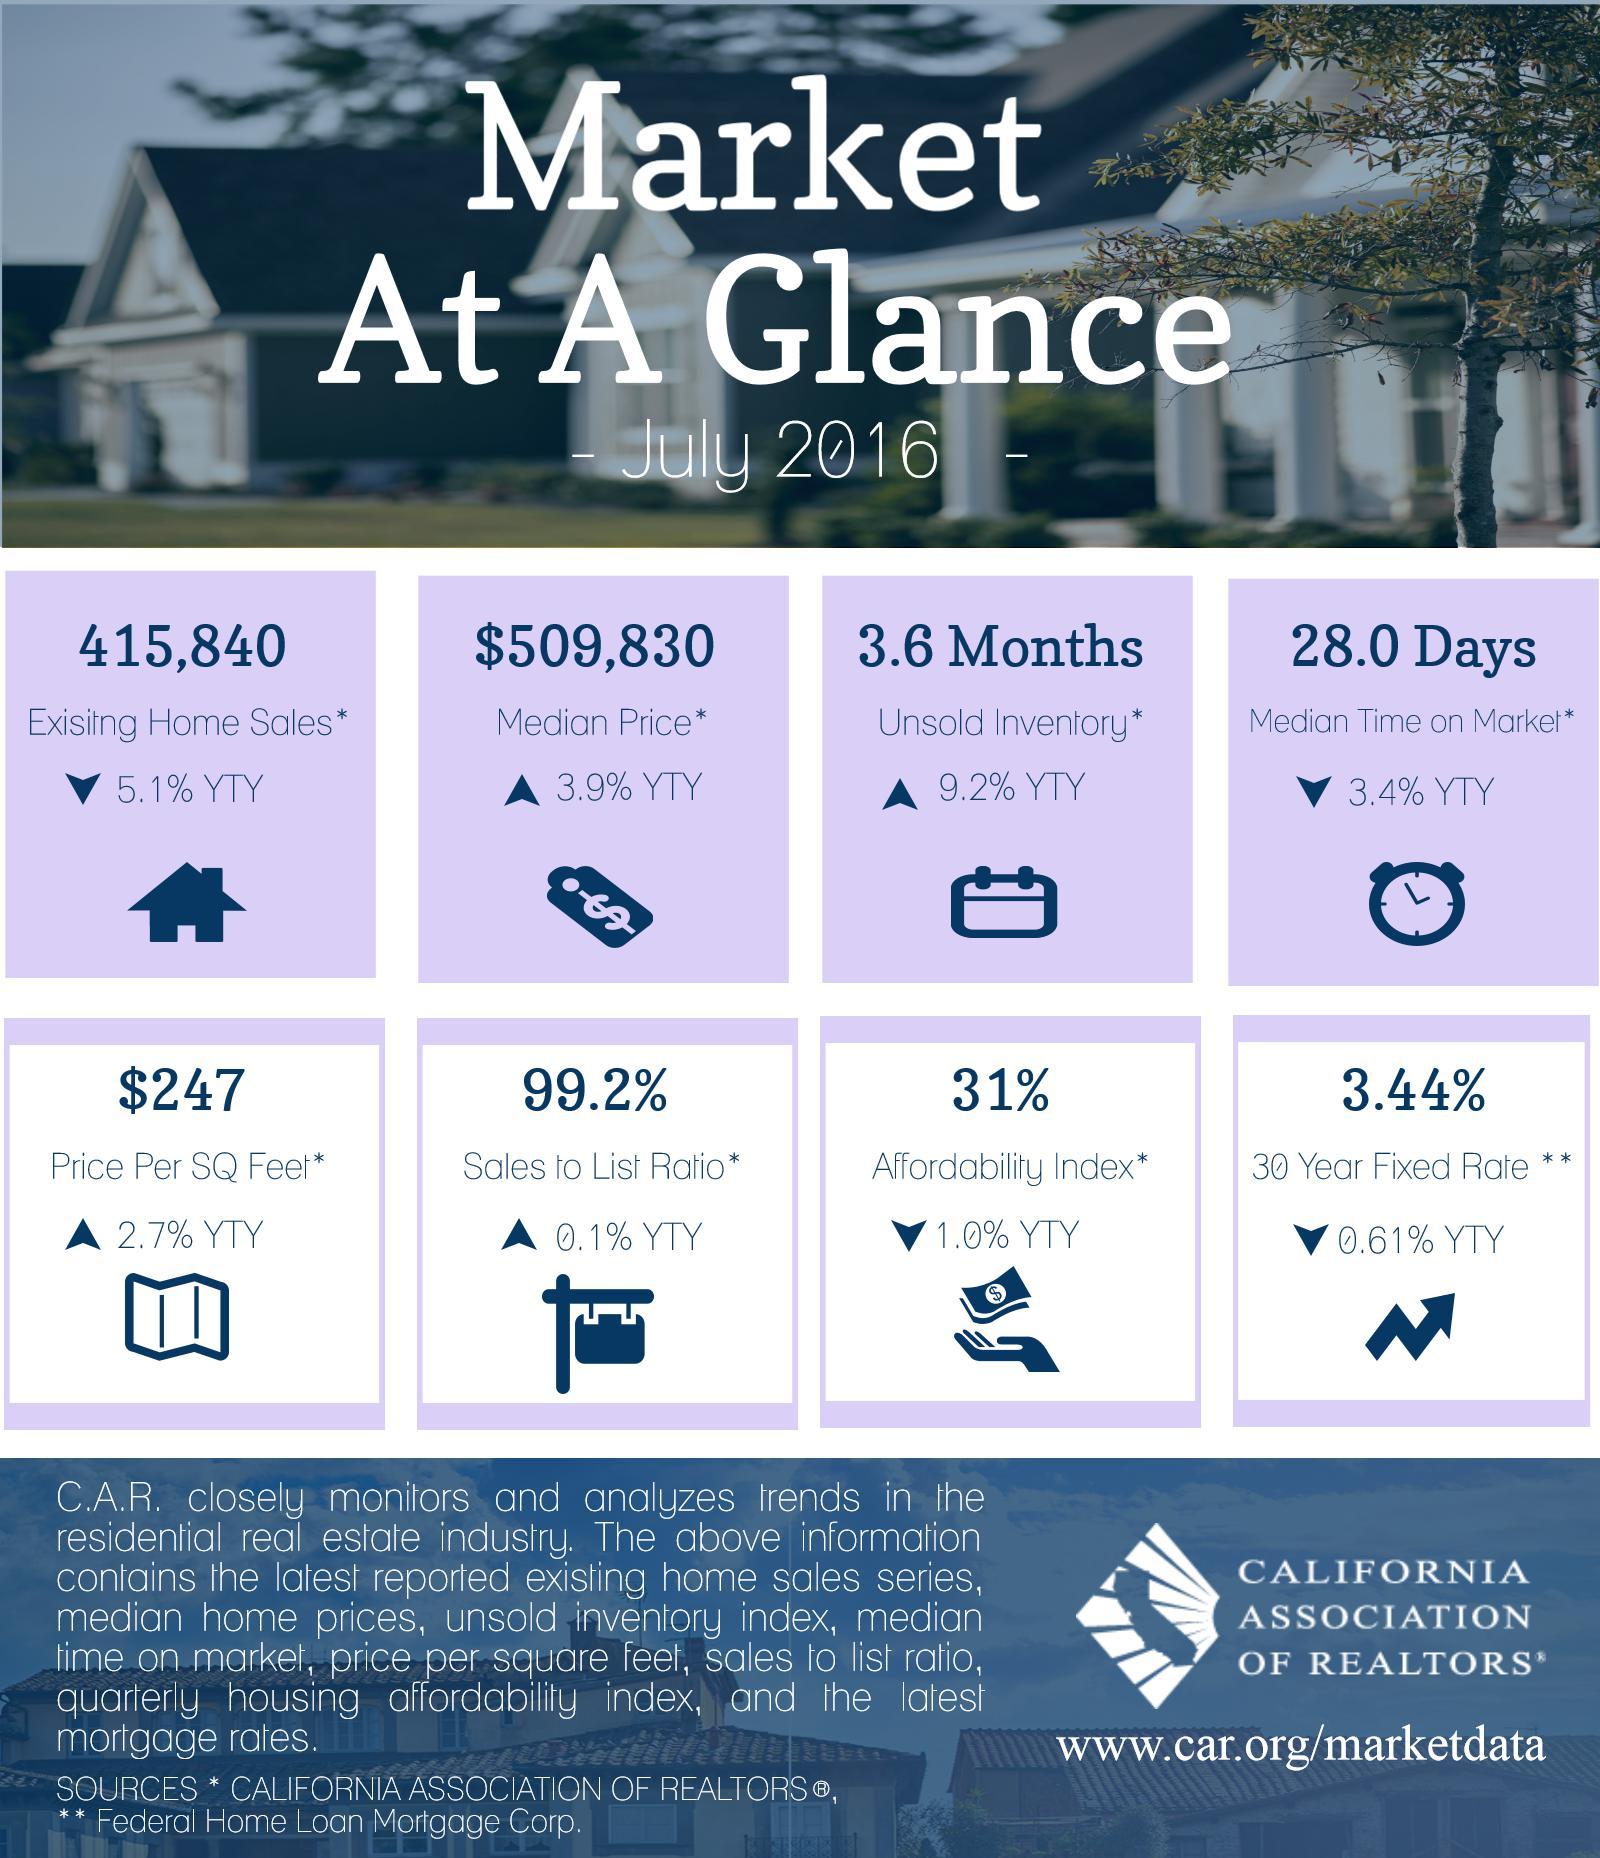 market-at-glance-jul-16-ig